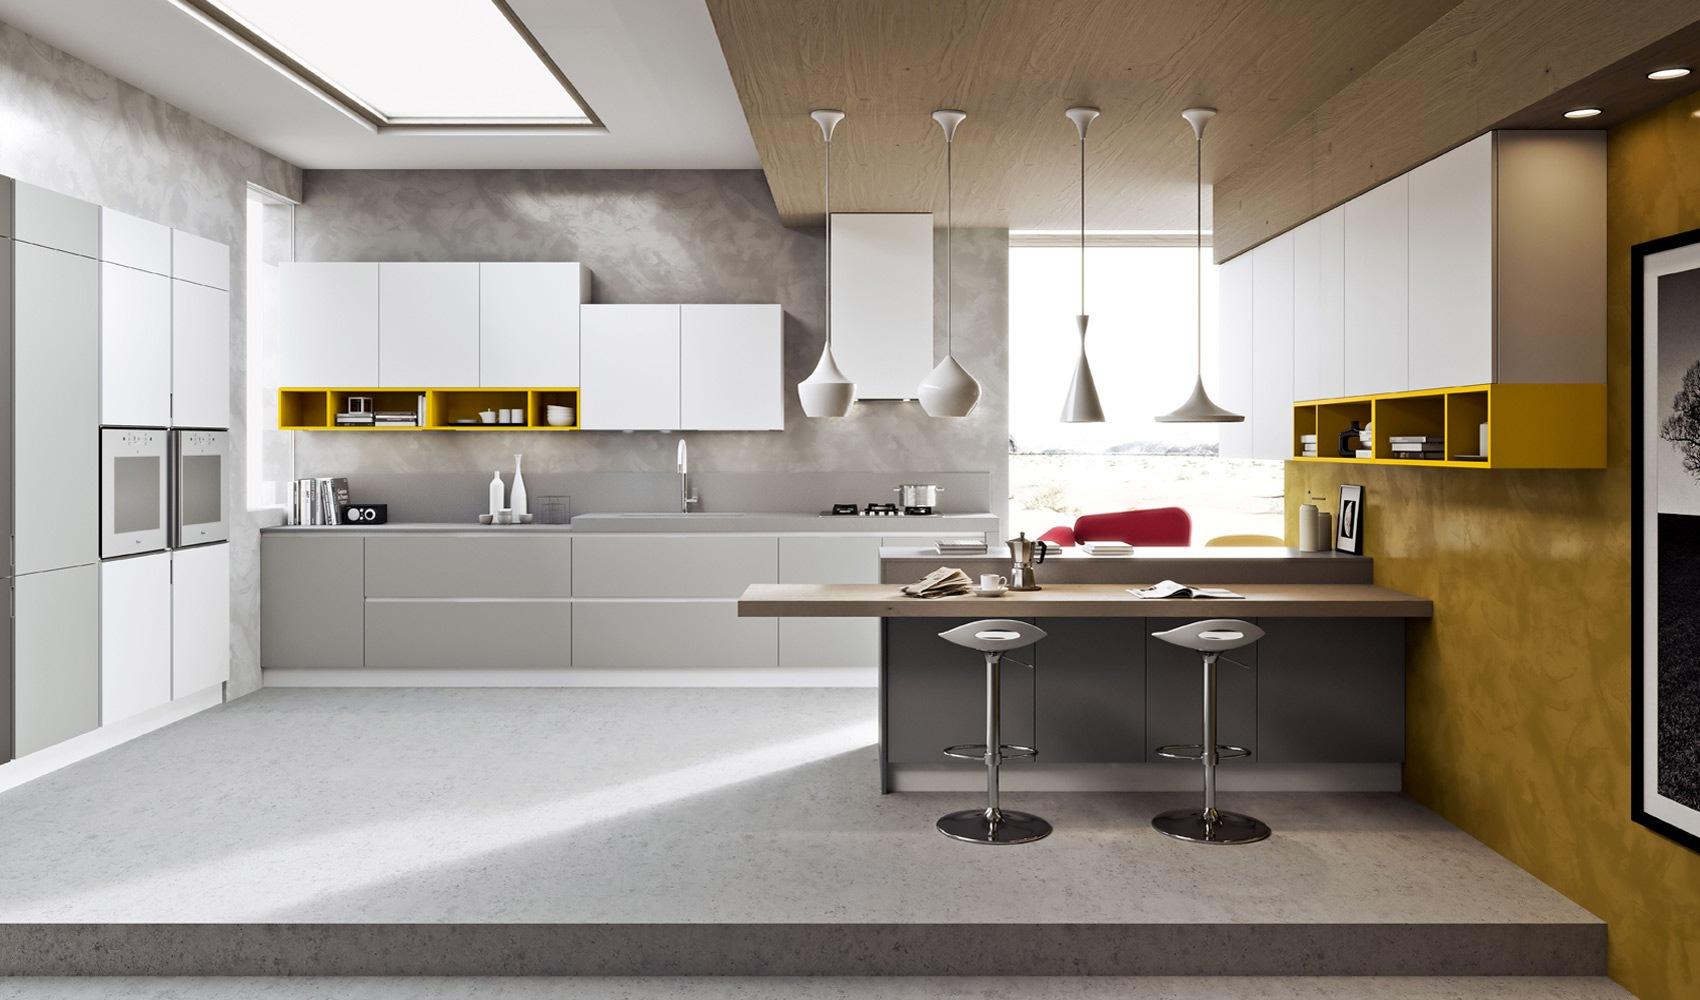 Бело-серый кухонный гарнитур с желтыми акцентами